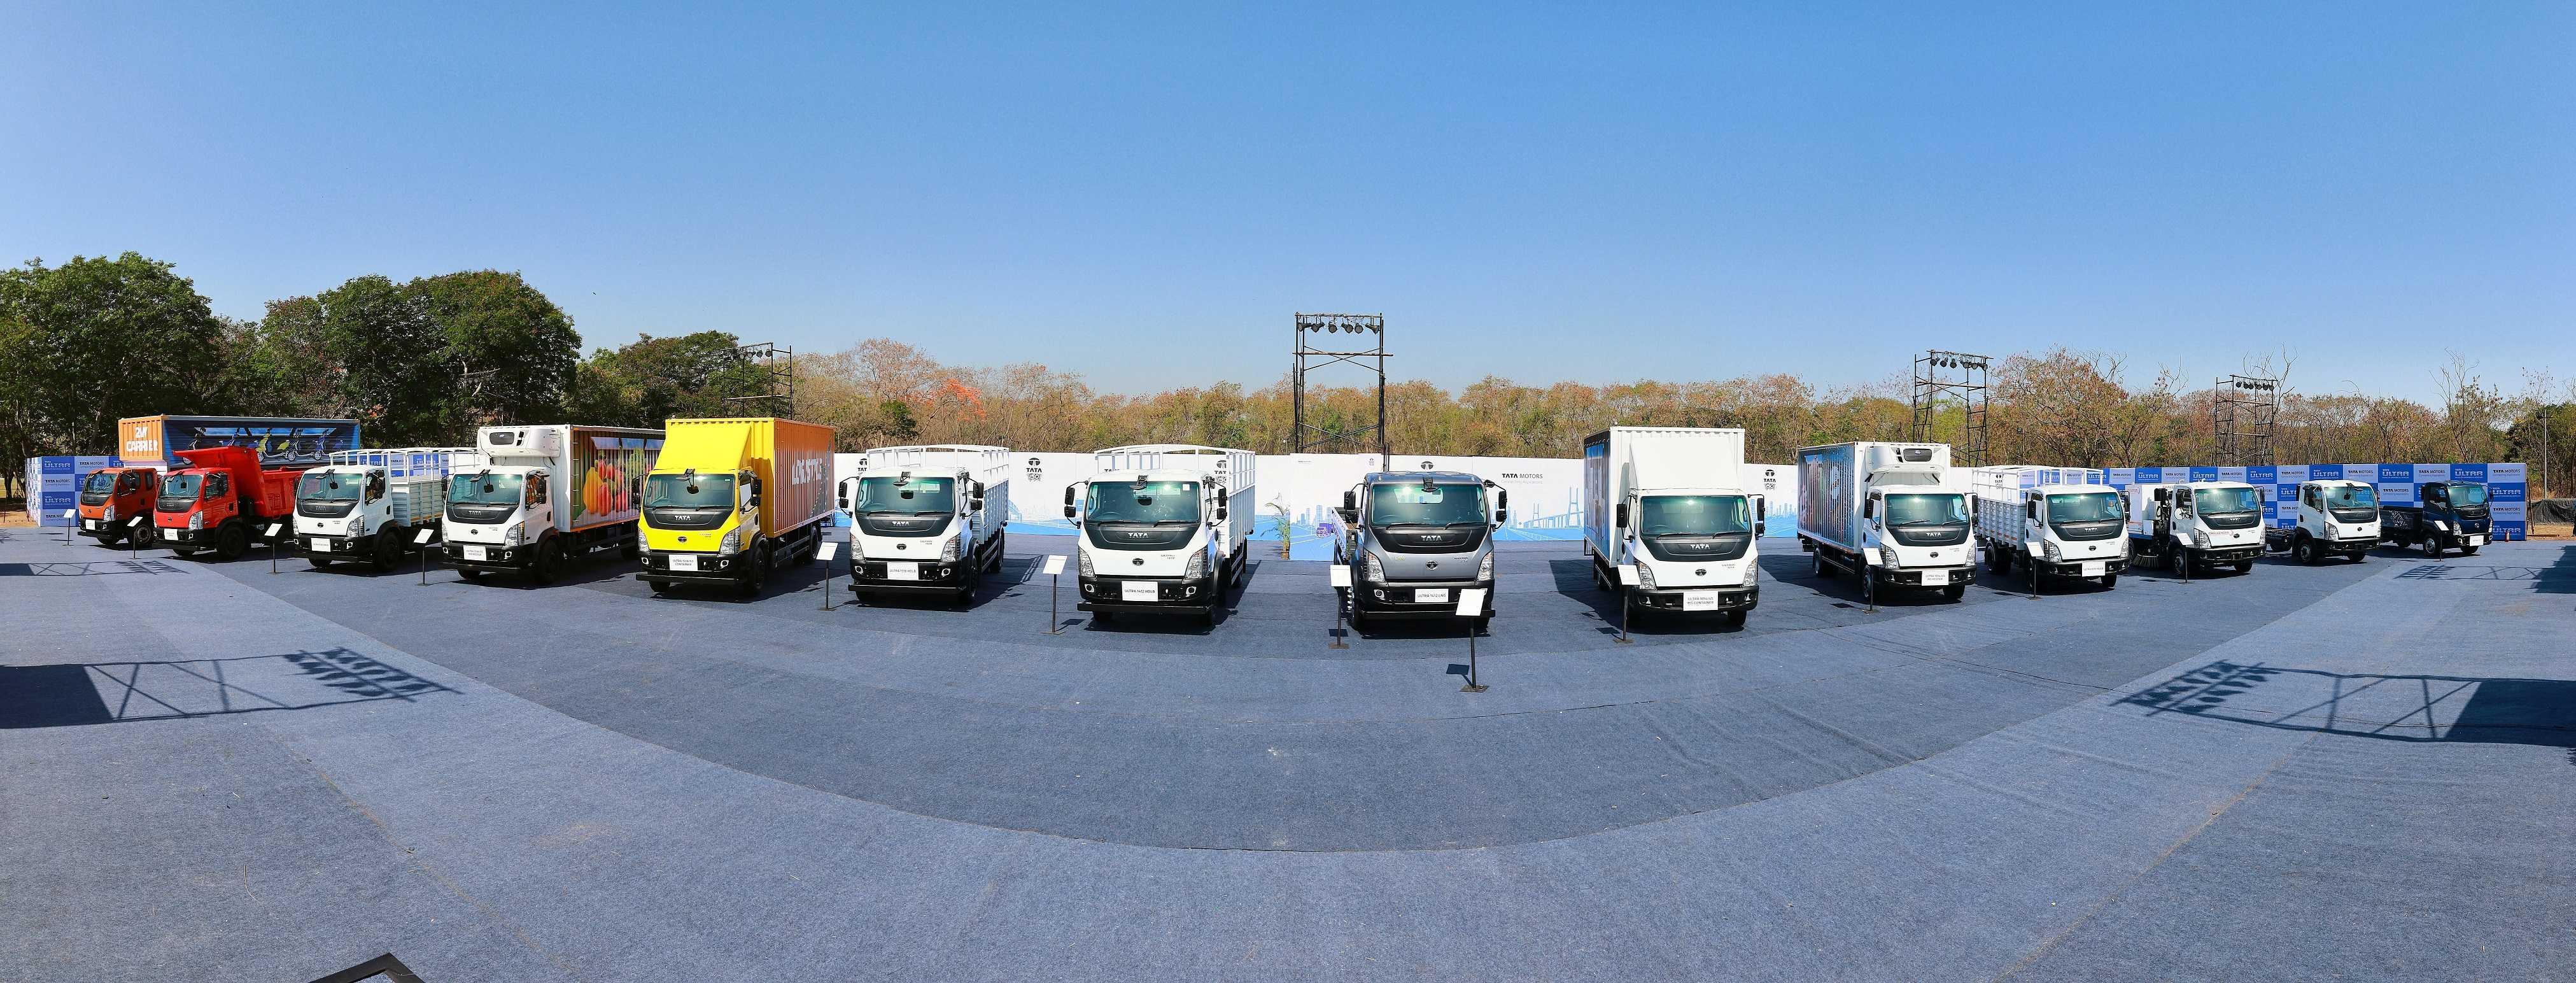 Tata Motors launches new range of Ultra trucks